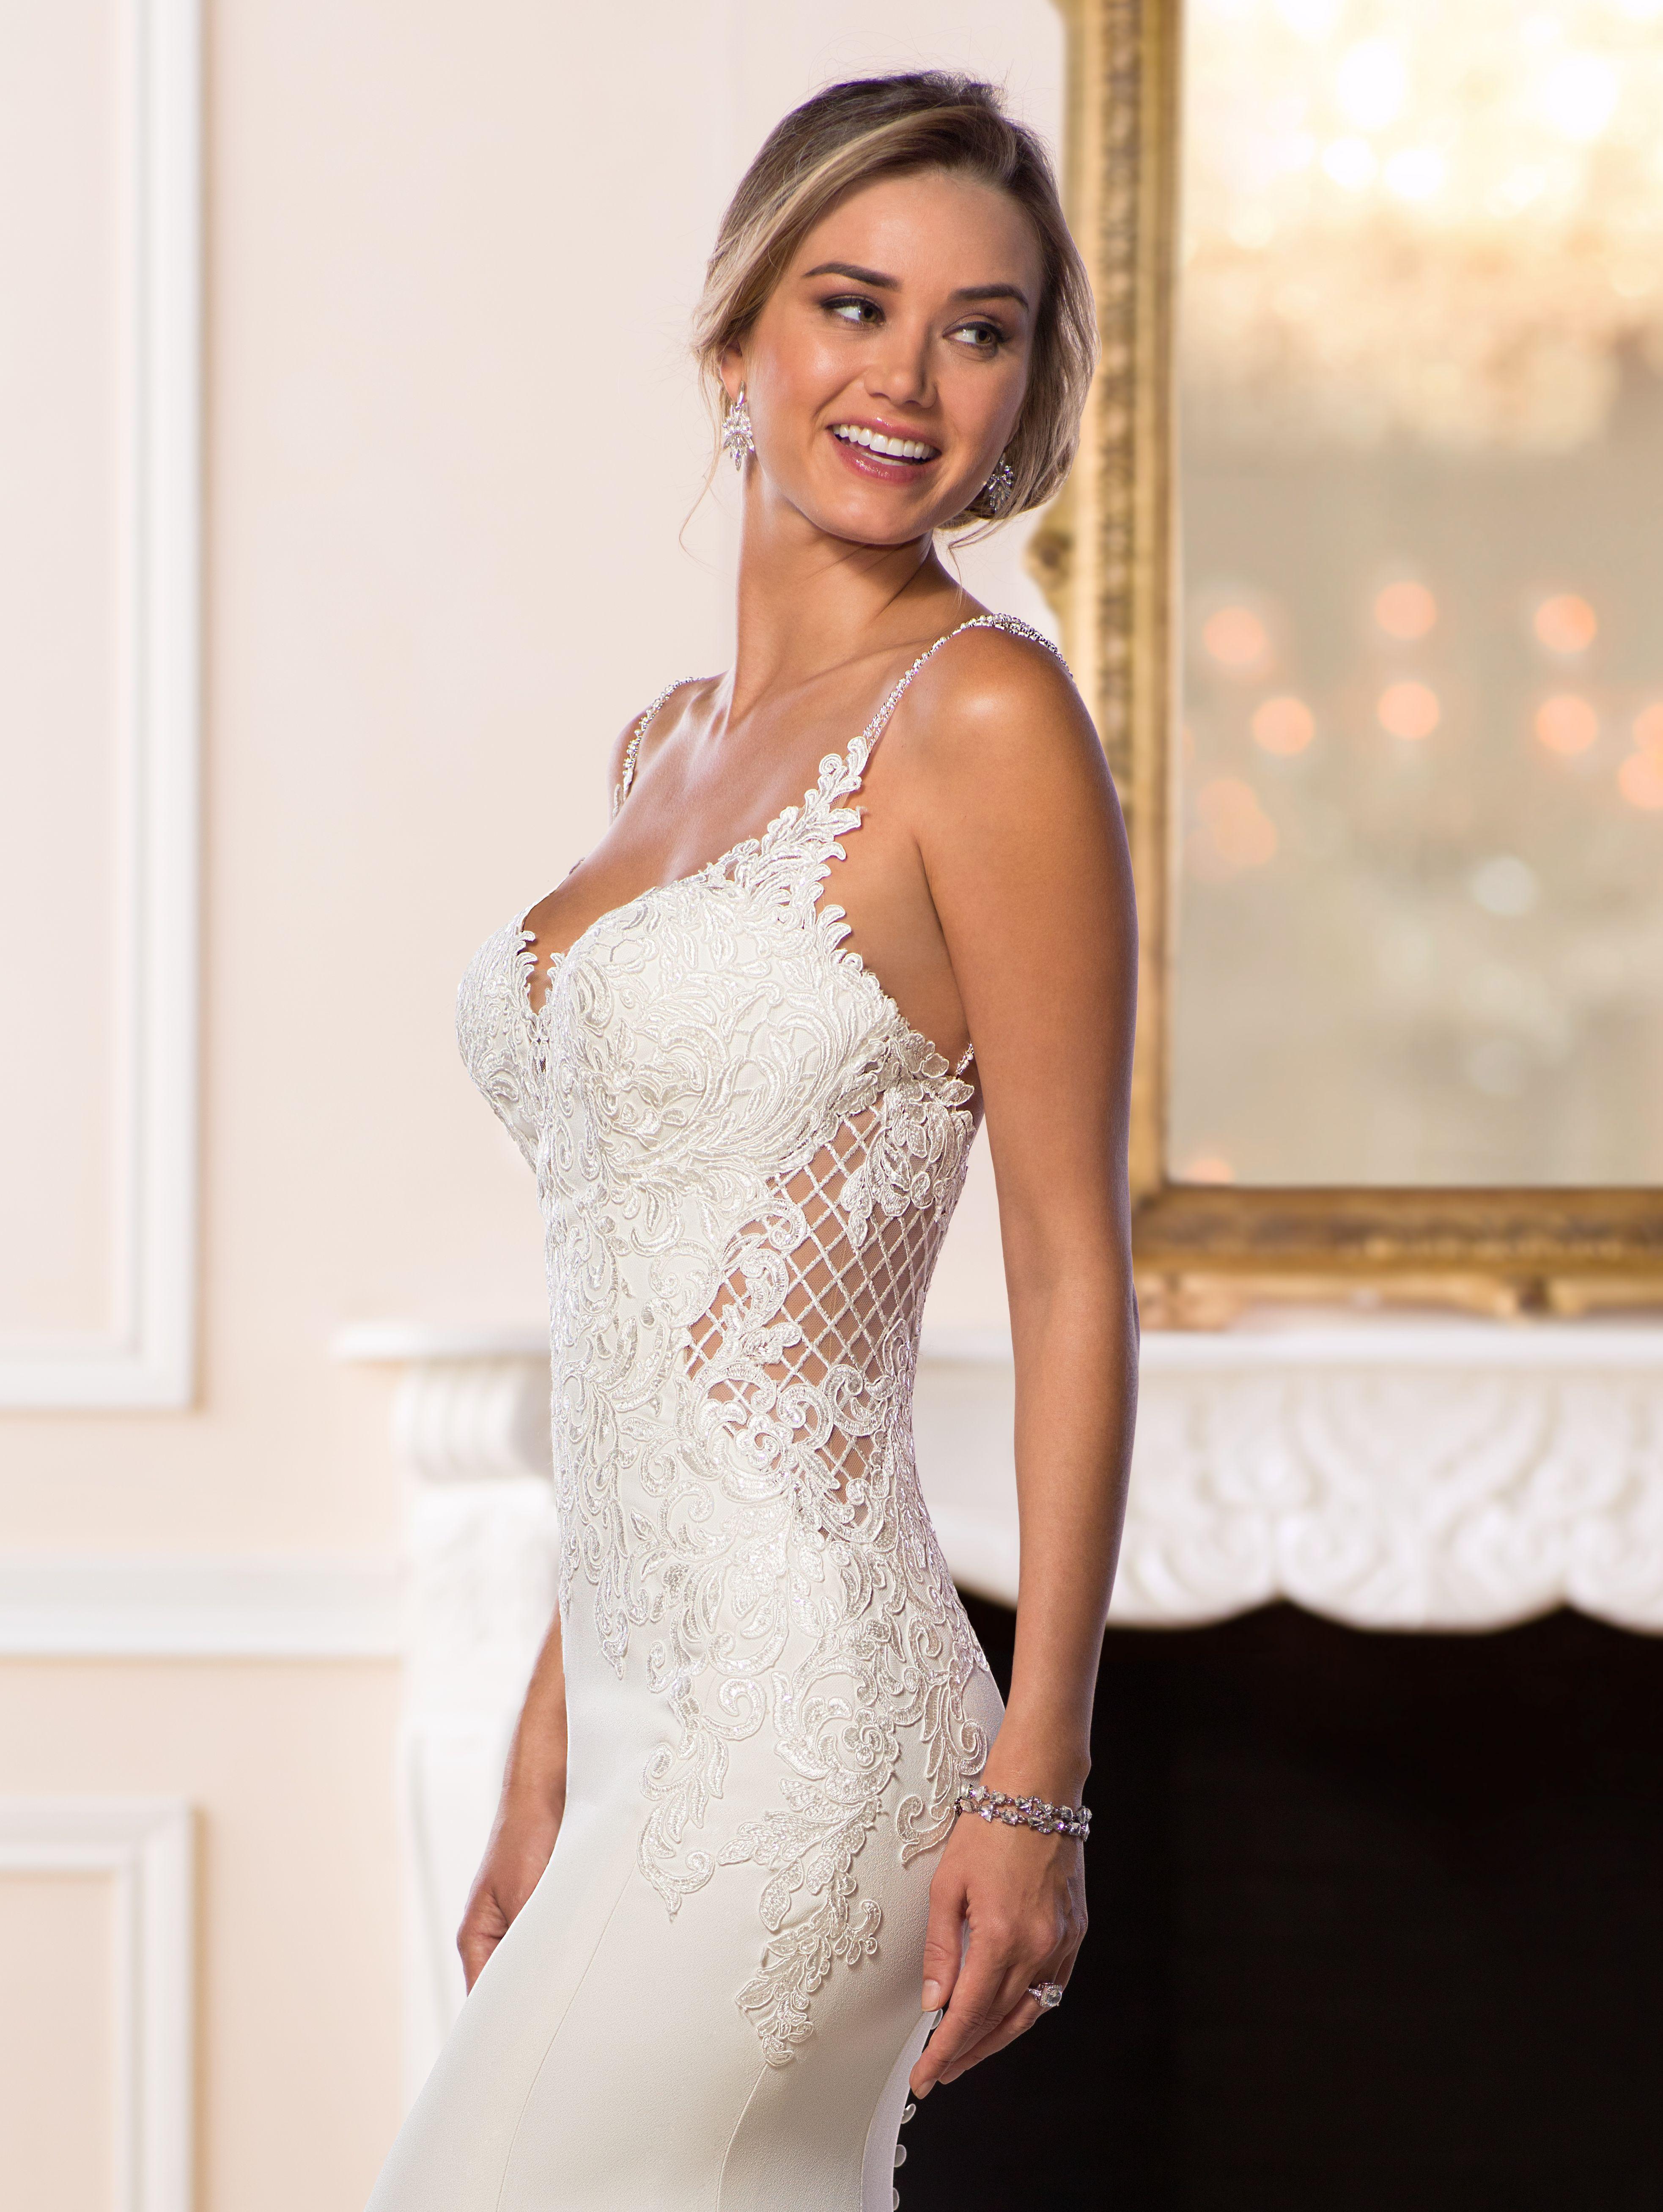 51864c23d06c33 Bruid Bruidsjurk Trouwjurk Bride Weddingdress Stella York Boho Bohemian  Ibiza Kant Lace Open rug Backless Open